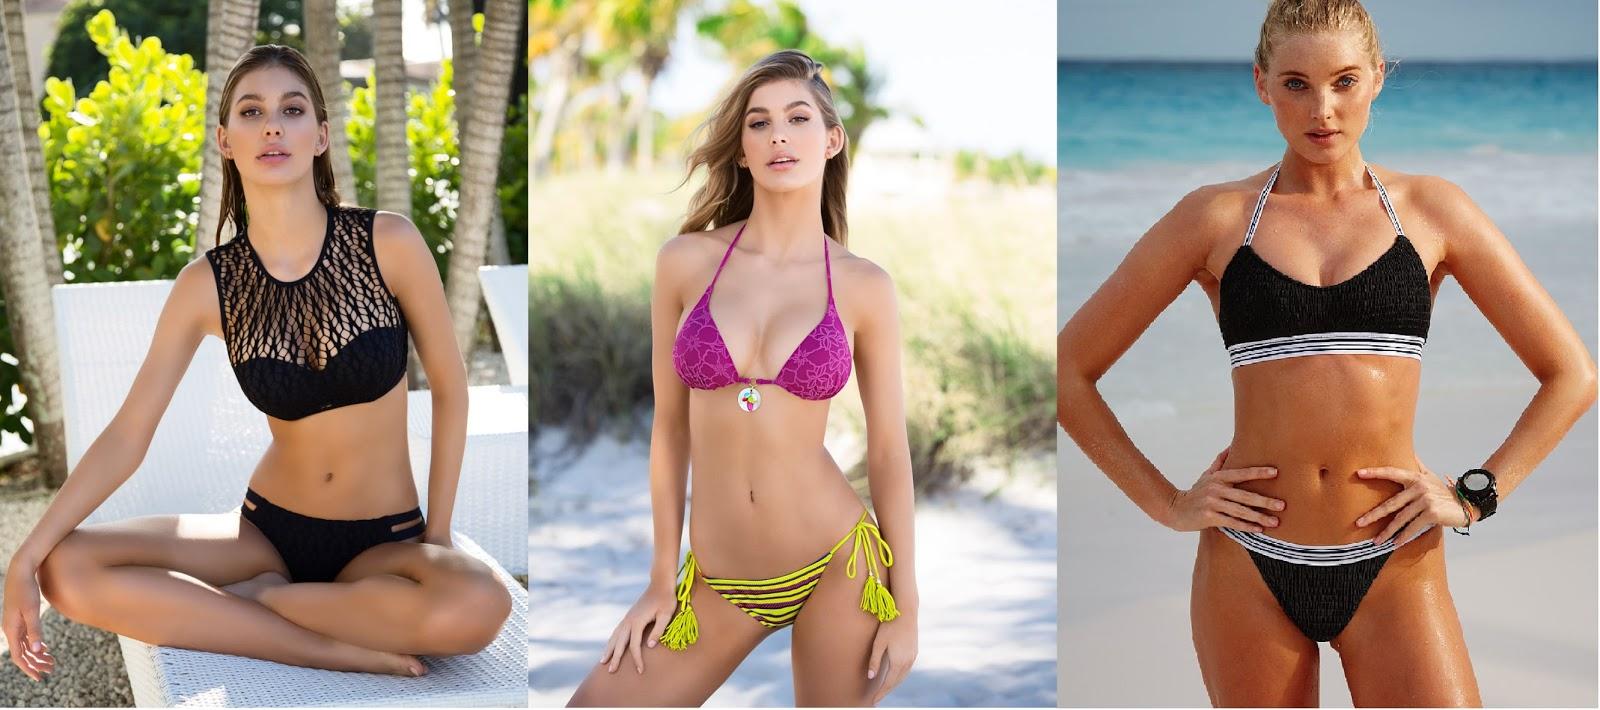 Etiket: bikini modelleri